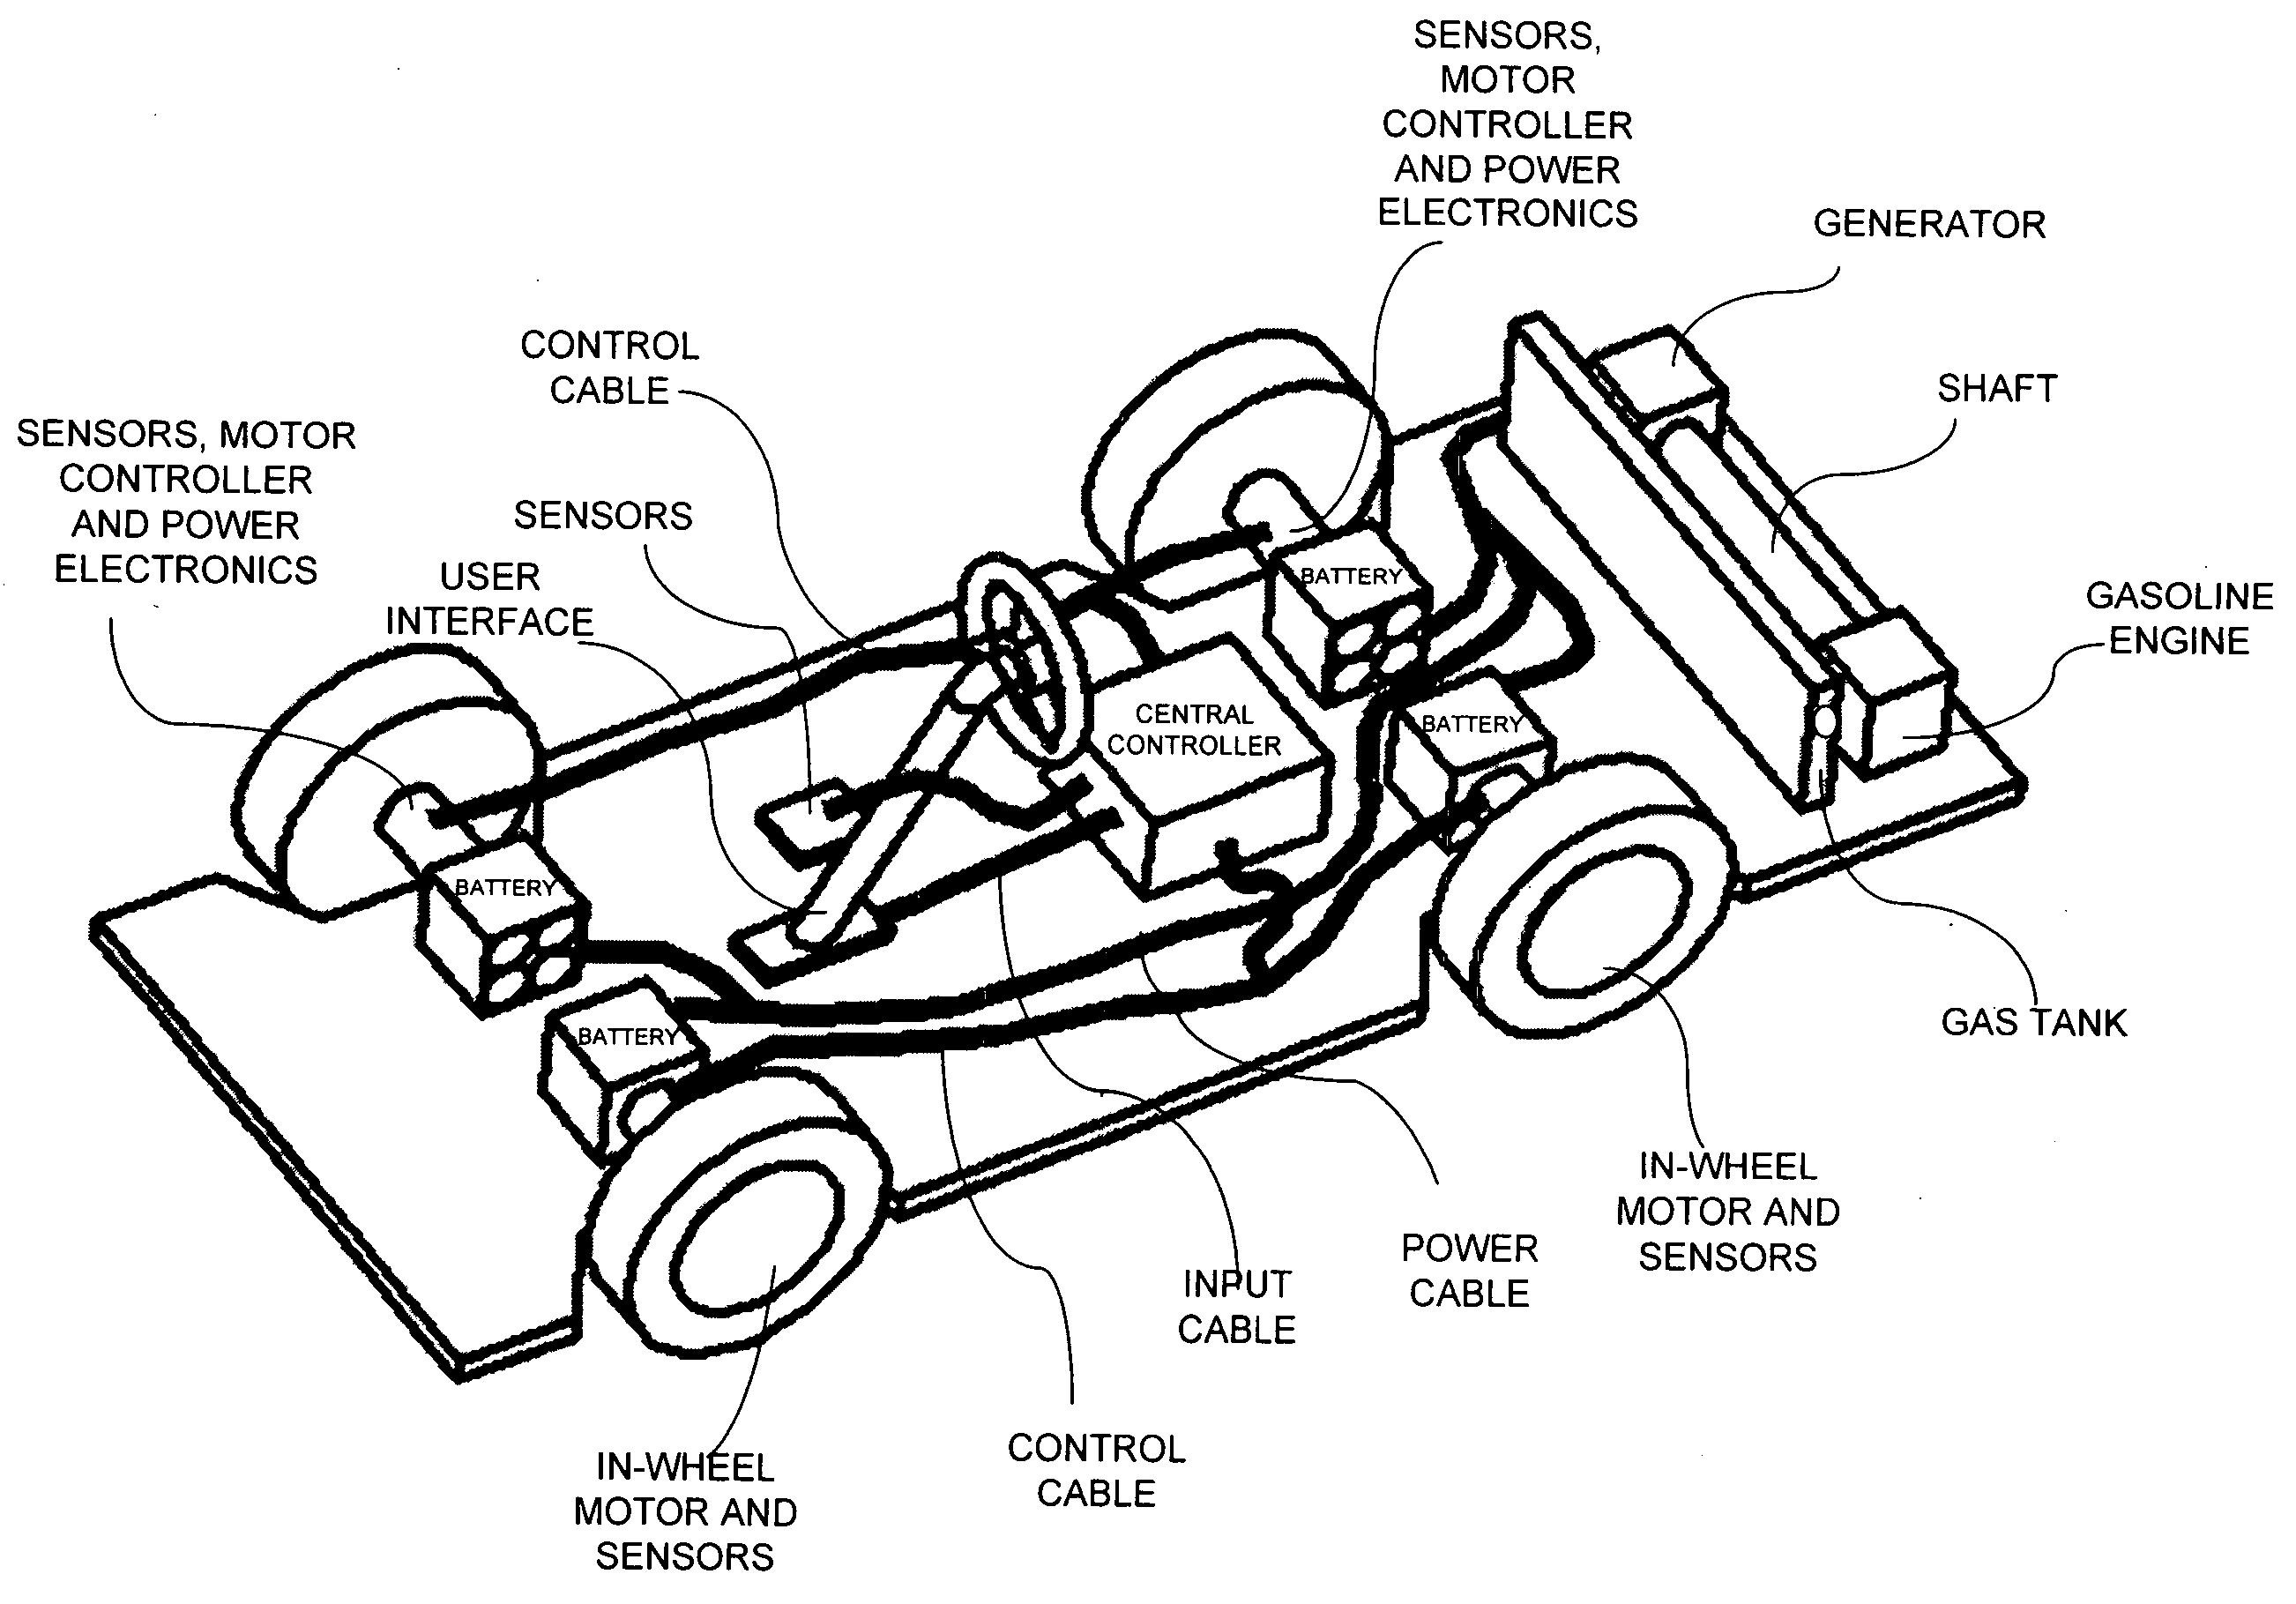 patent us20050045392 - in-wheel electric motors